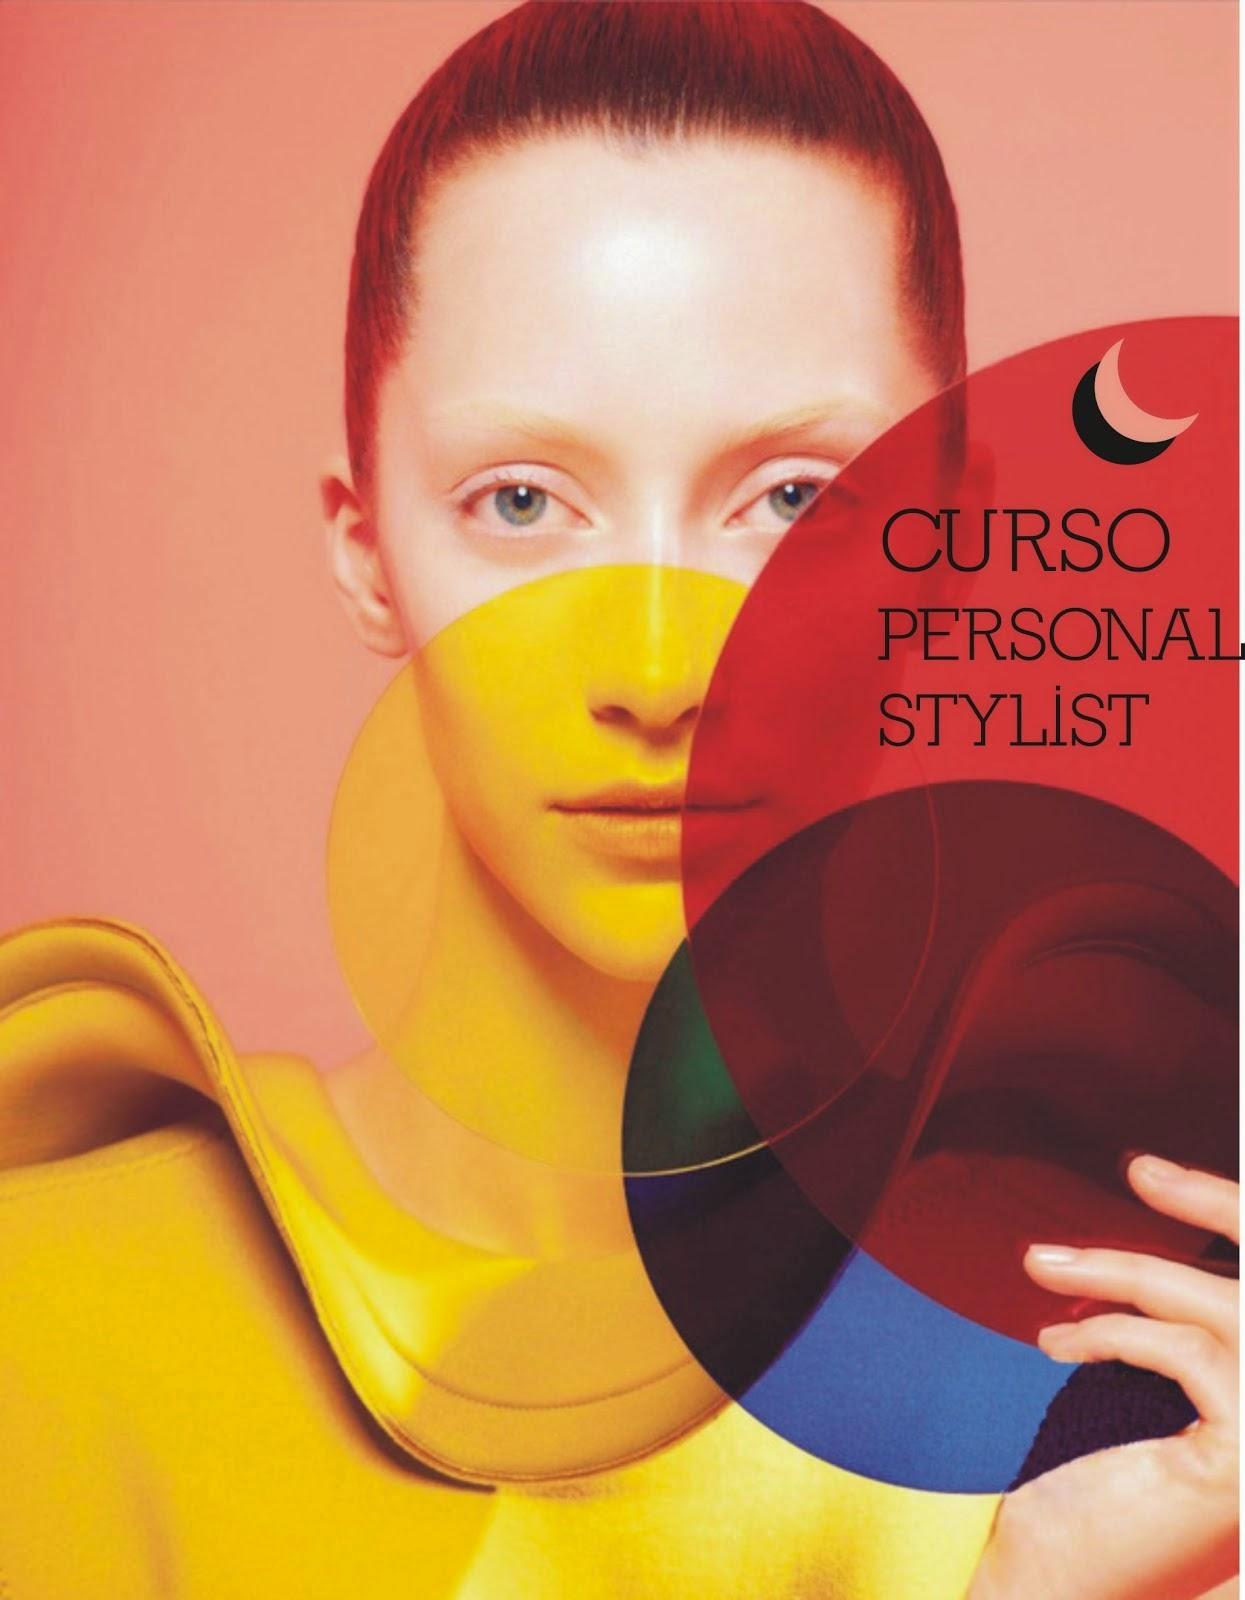 Curso Personal Stylist